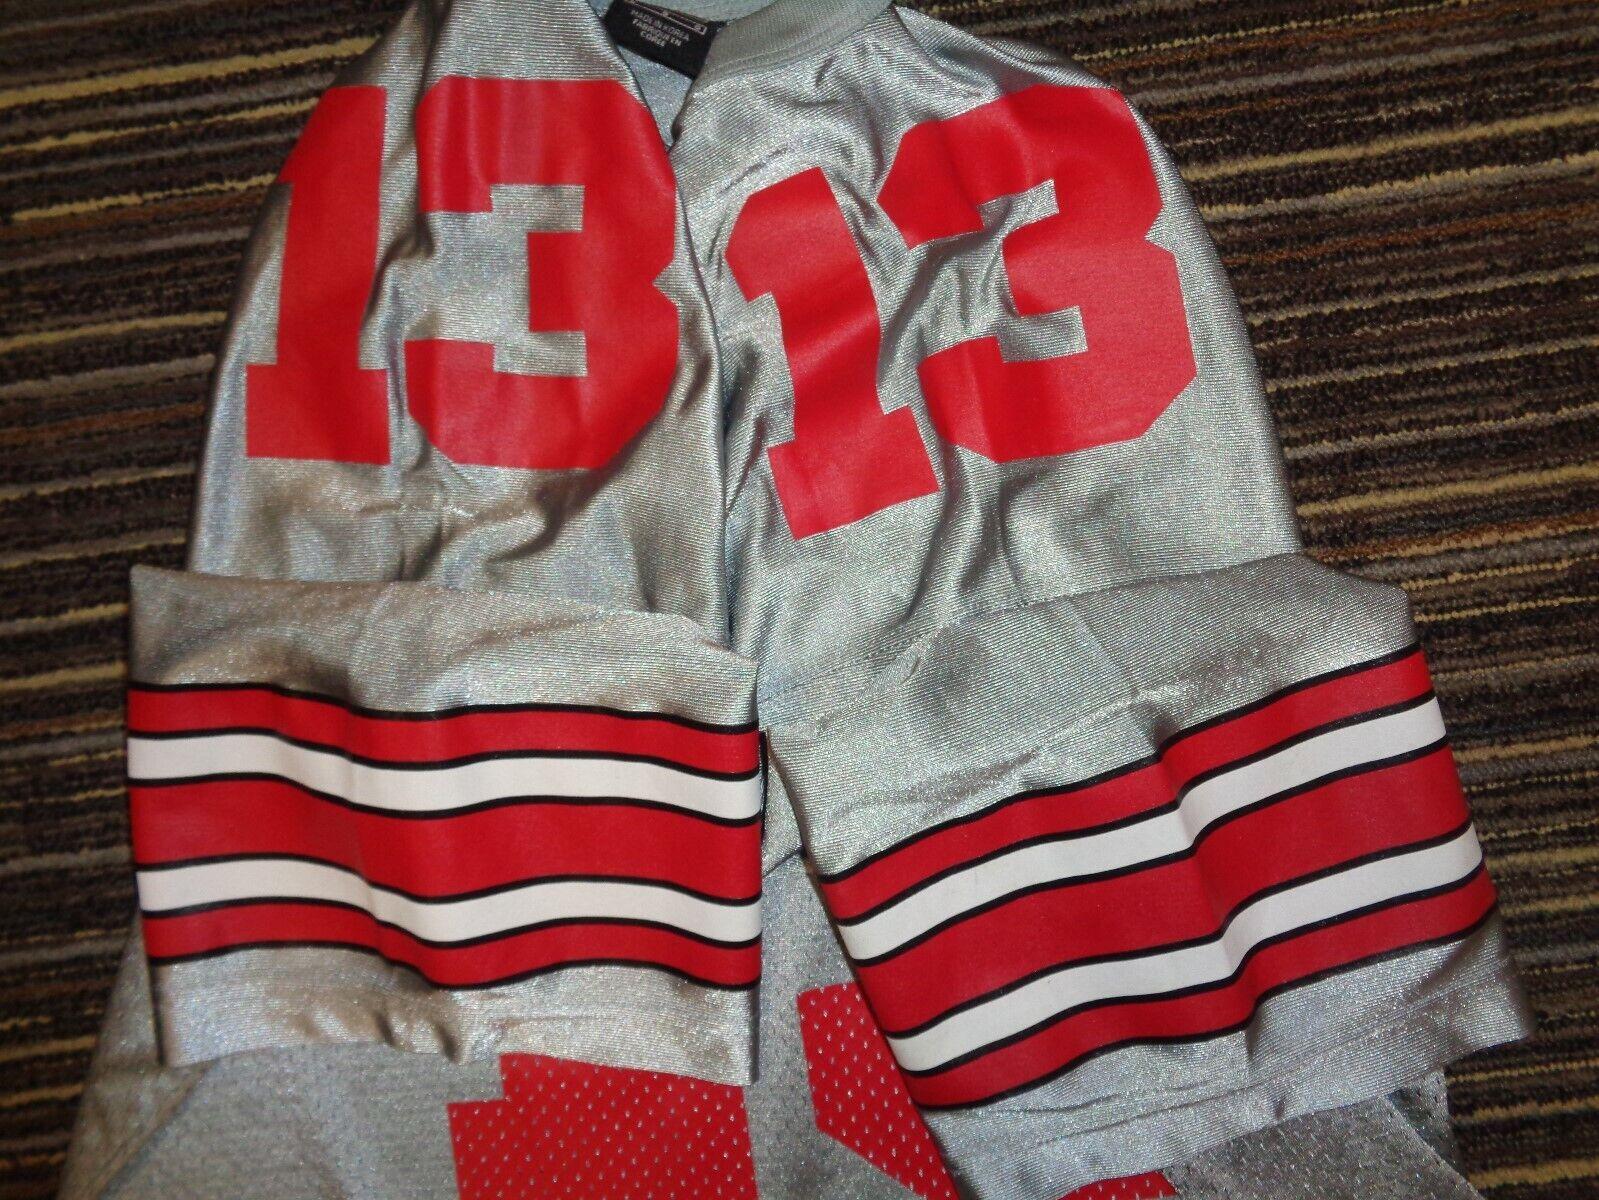 MAURICE CLARETT OHIO STATE BUCKEYES NIKE NCAA COLLEGE SILVER GRAY GAME JERSEY LG - $79.99